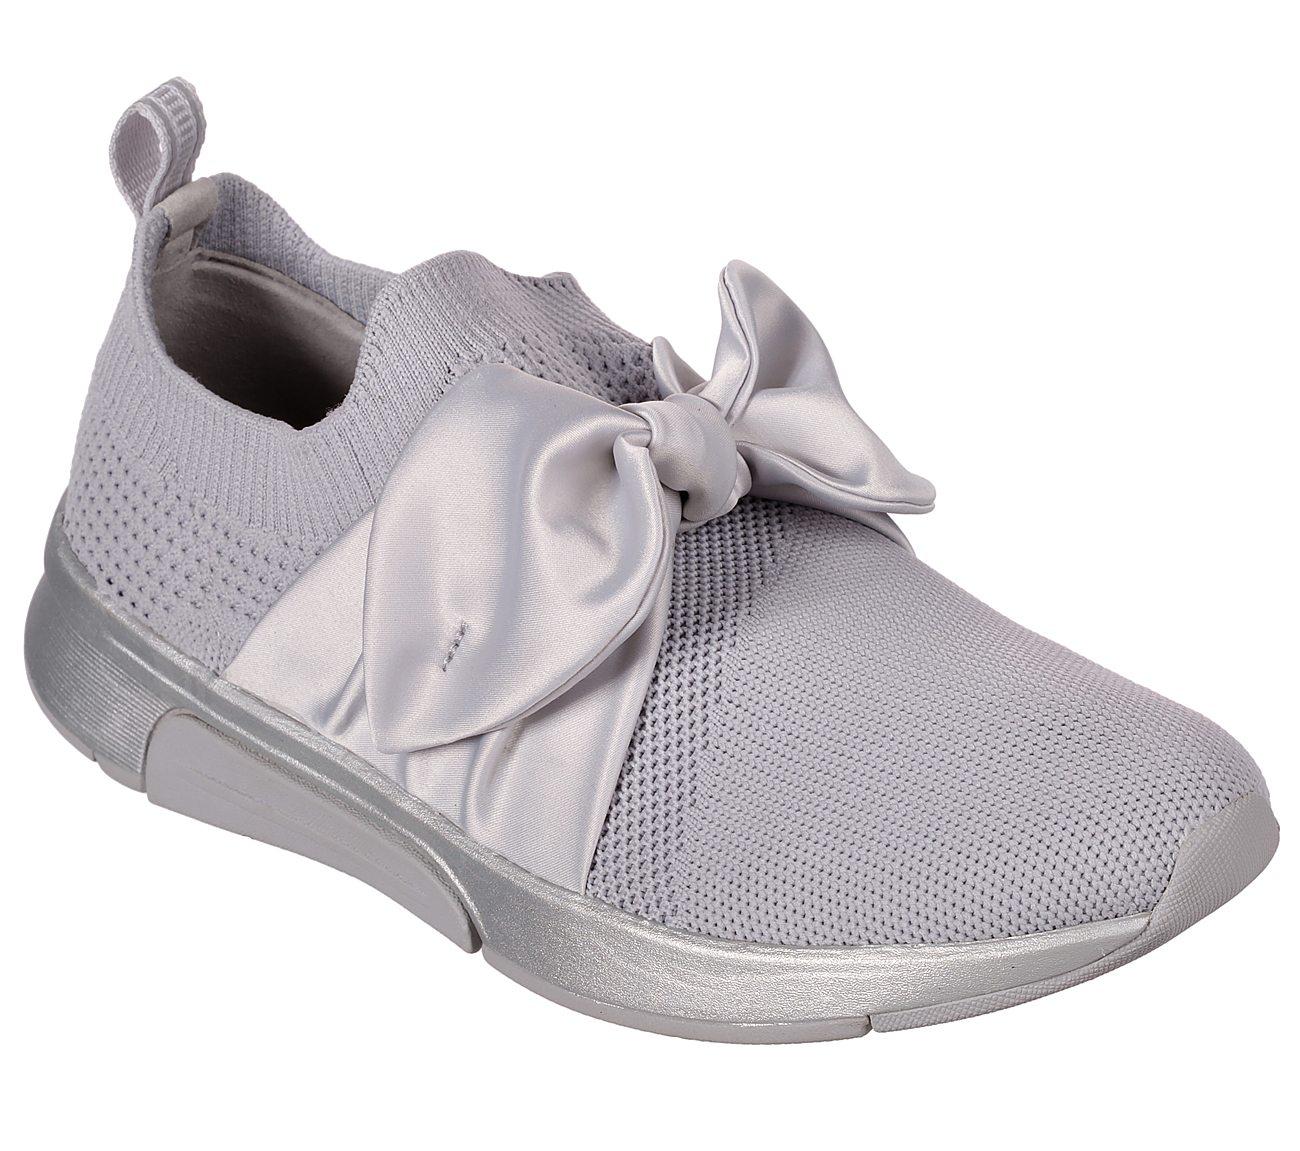 Buy SKECHERS Modern Jogger - Debbie Slip-On Shoes Shoes only  85.00 639e72d554